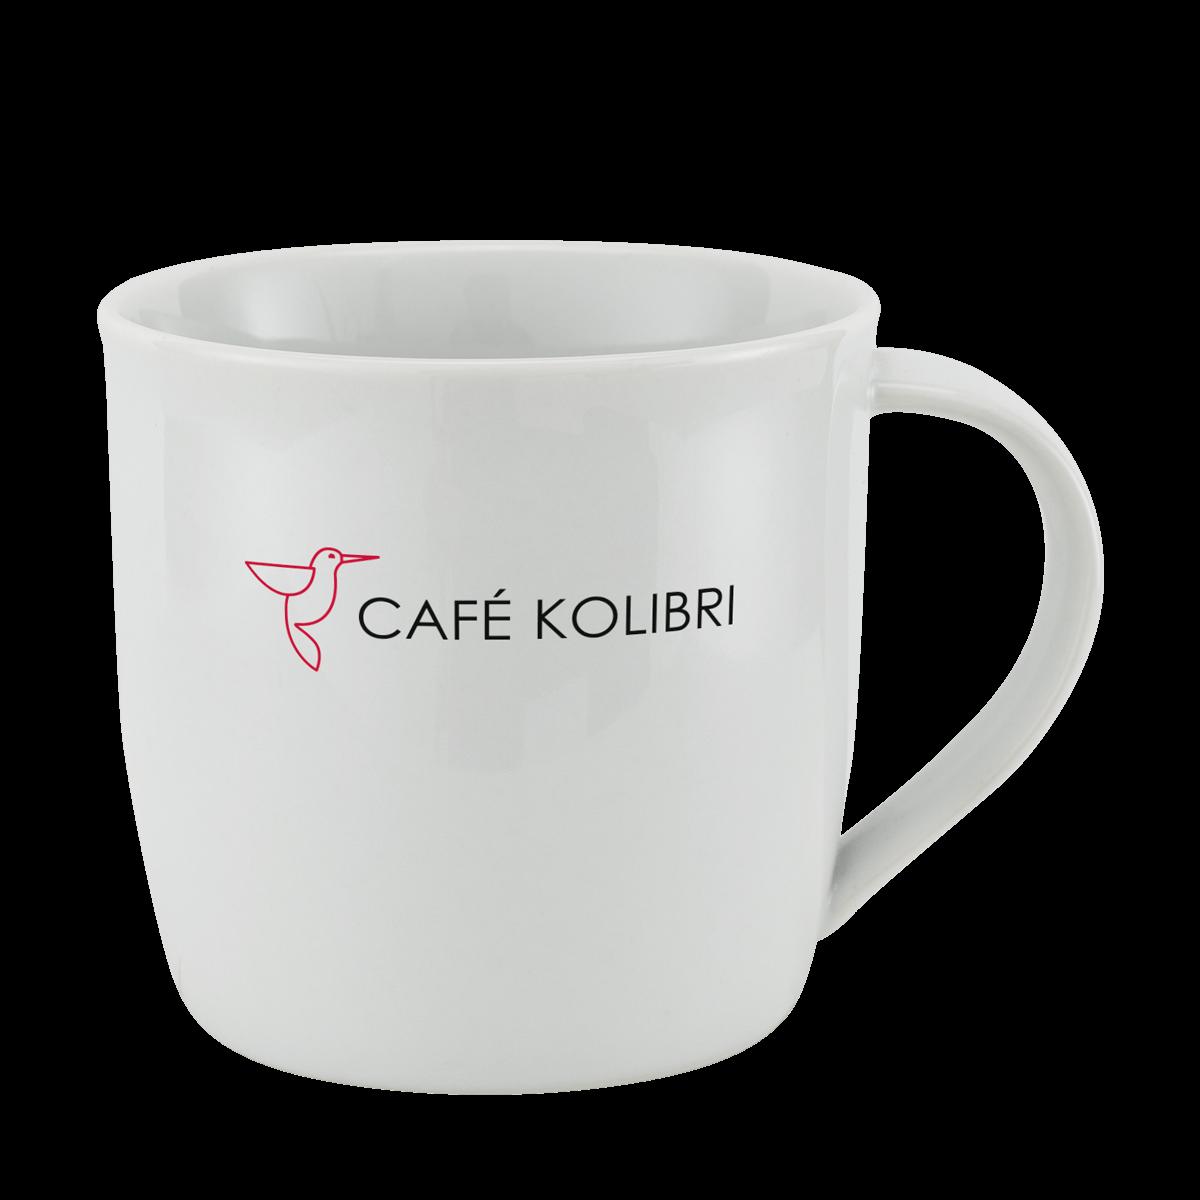 Kyoto_S067_DD_TRD_TD_Cafe_Kolibri_P1_1200px